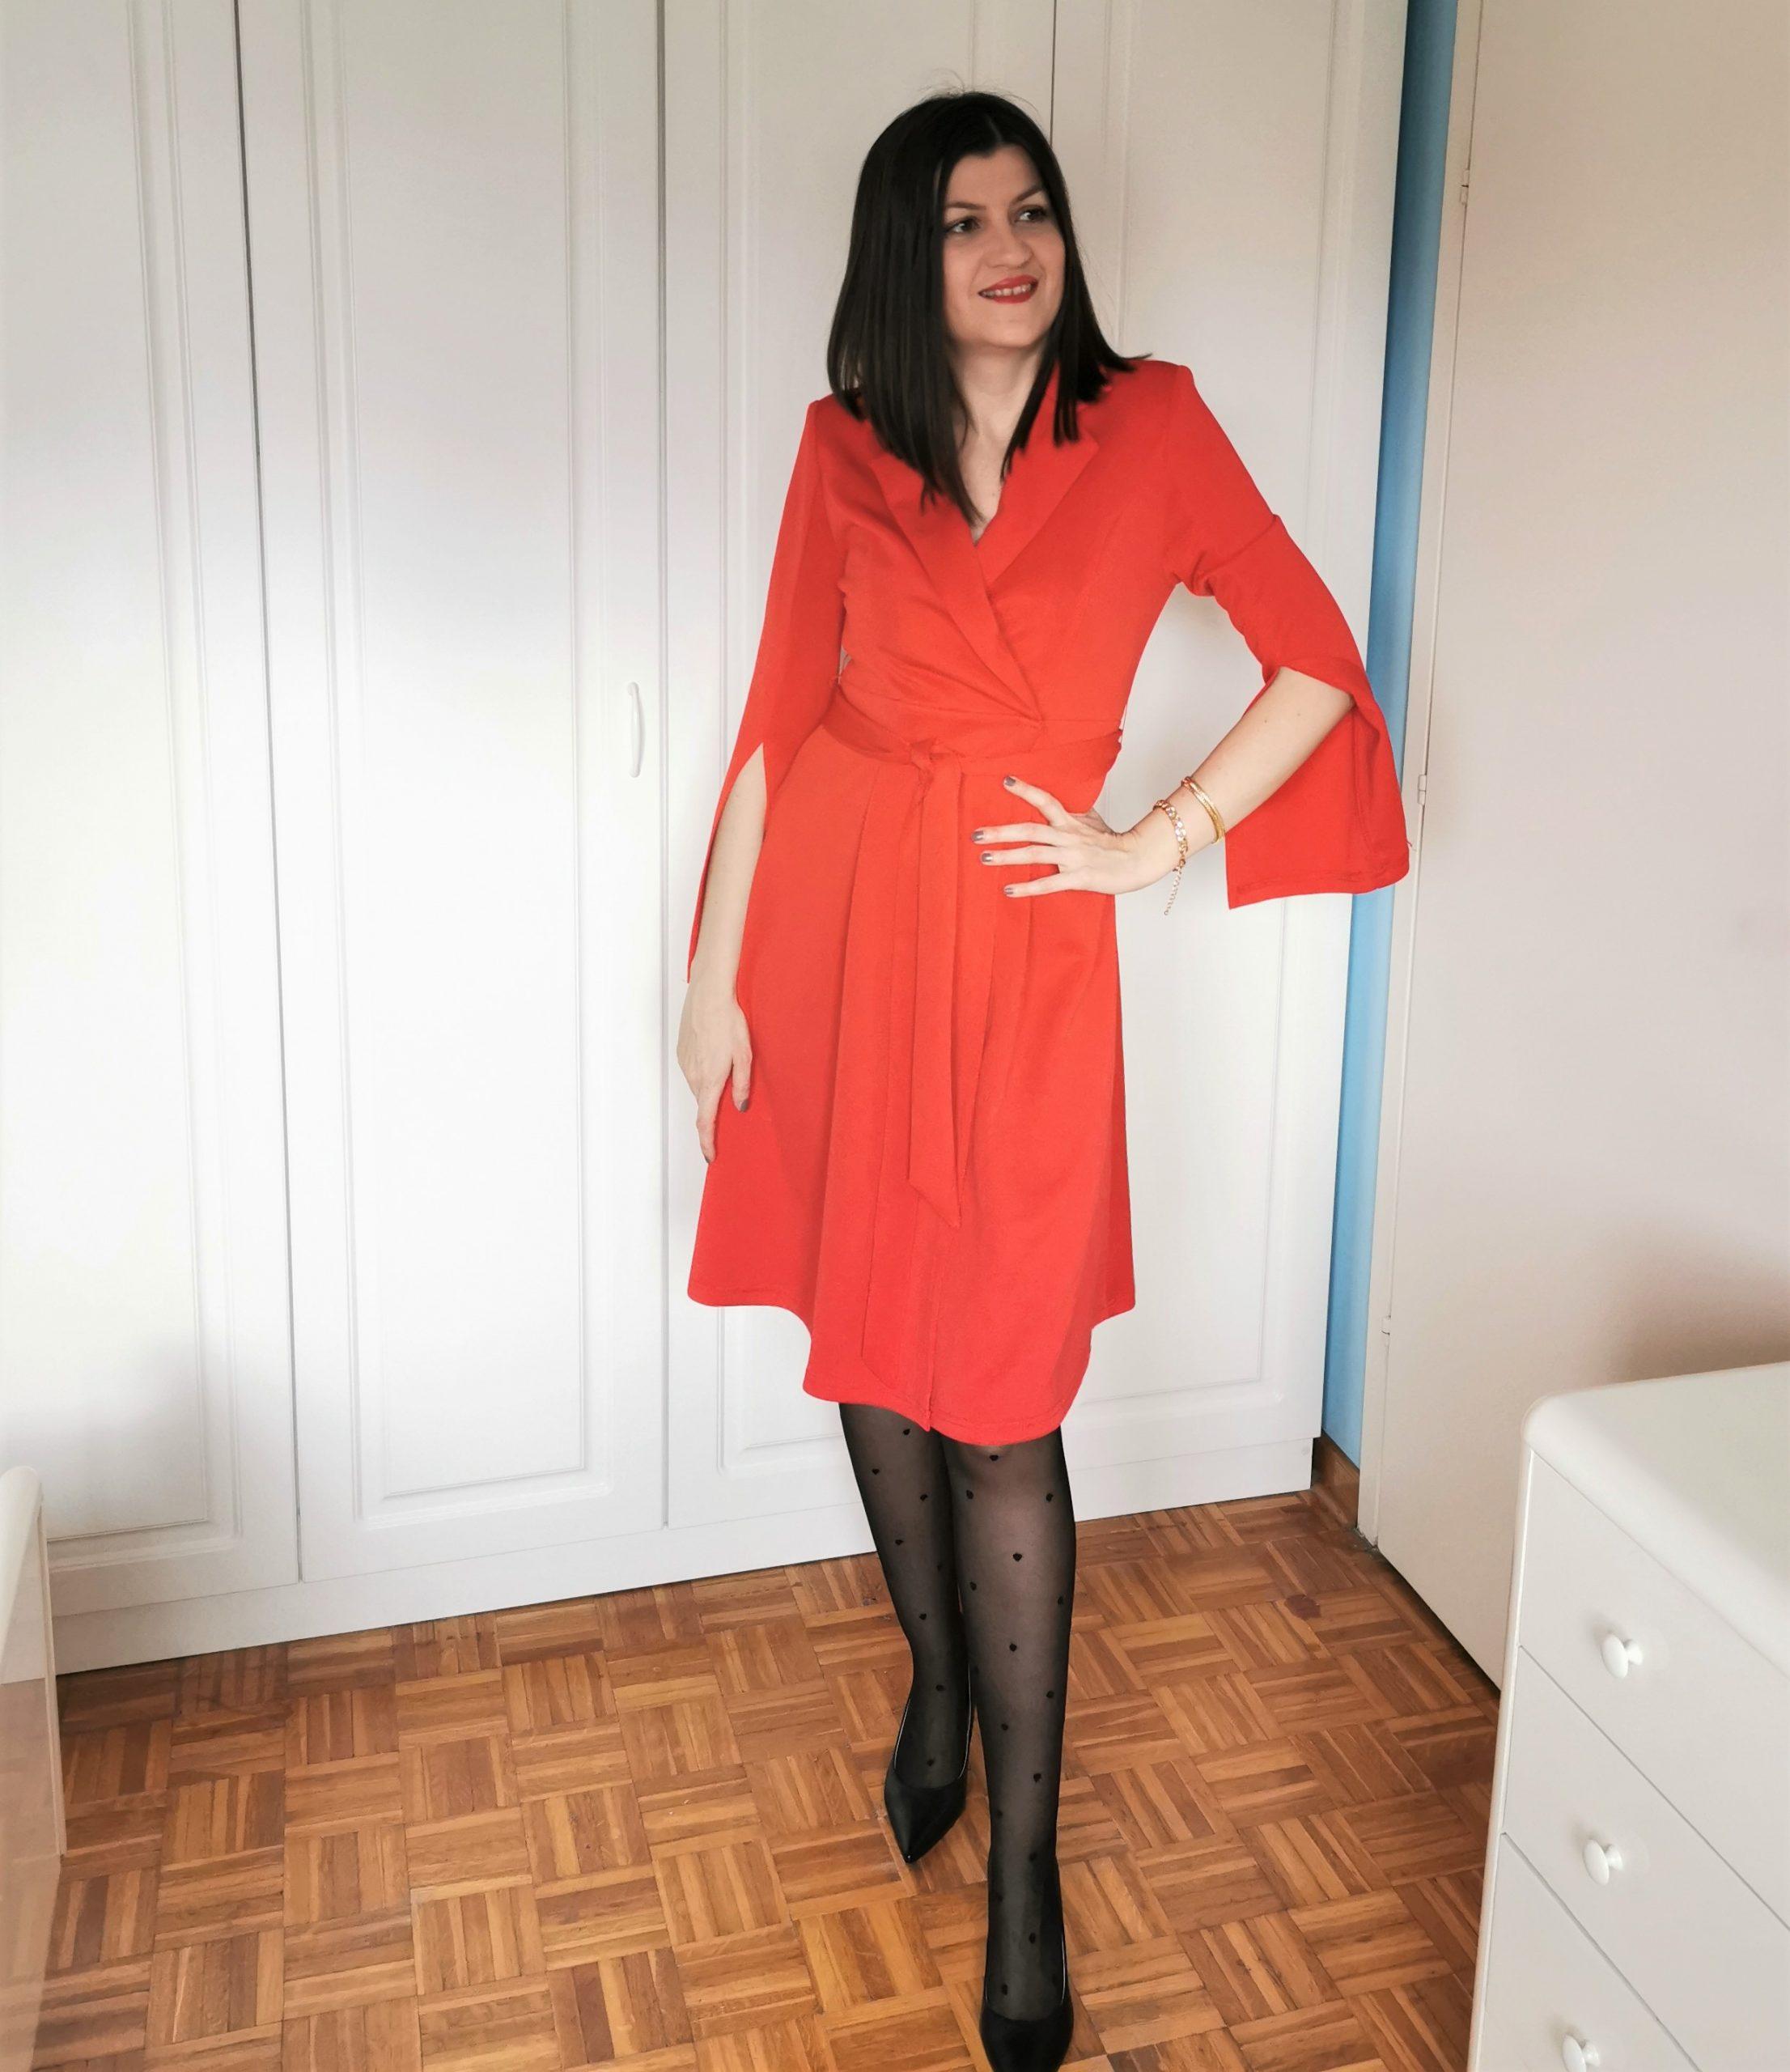 timeless wardrobe pieces / shein red dress